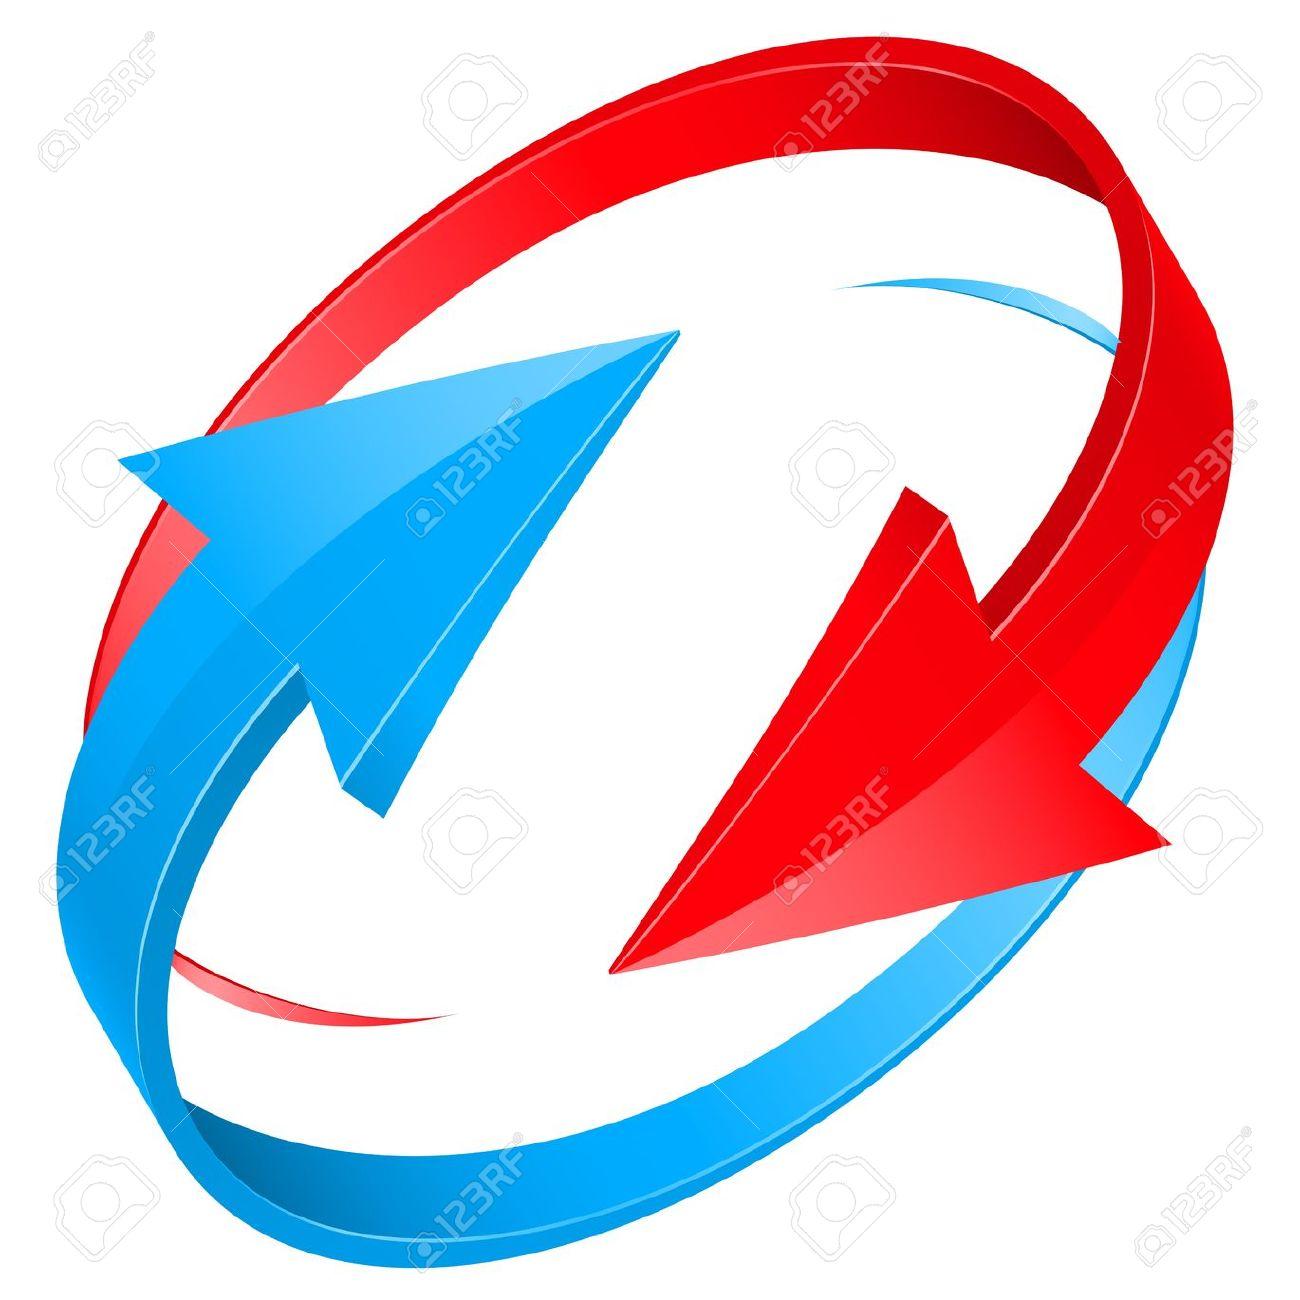 Clipart speed arrow transparent Clipart speed arrow - ClipartFest transparent